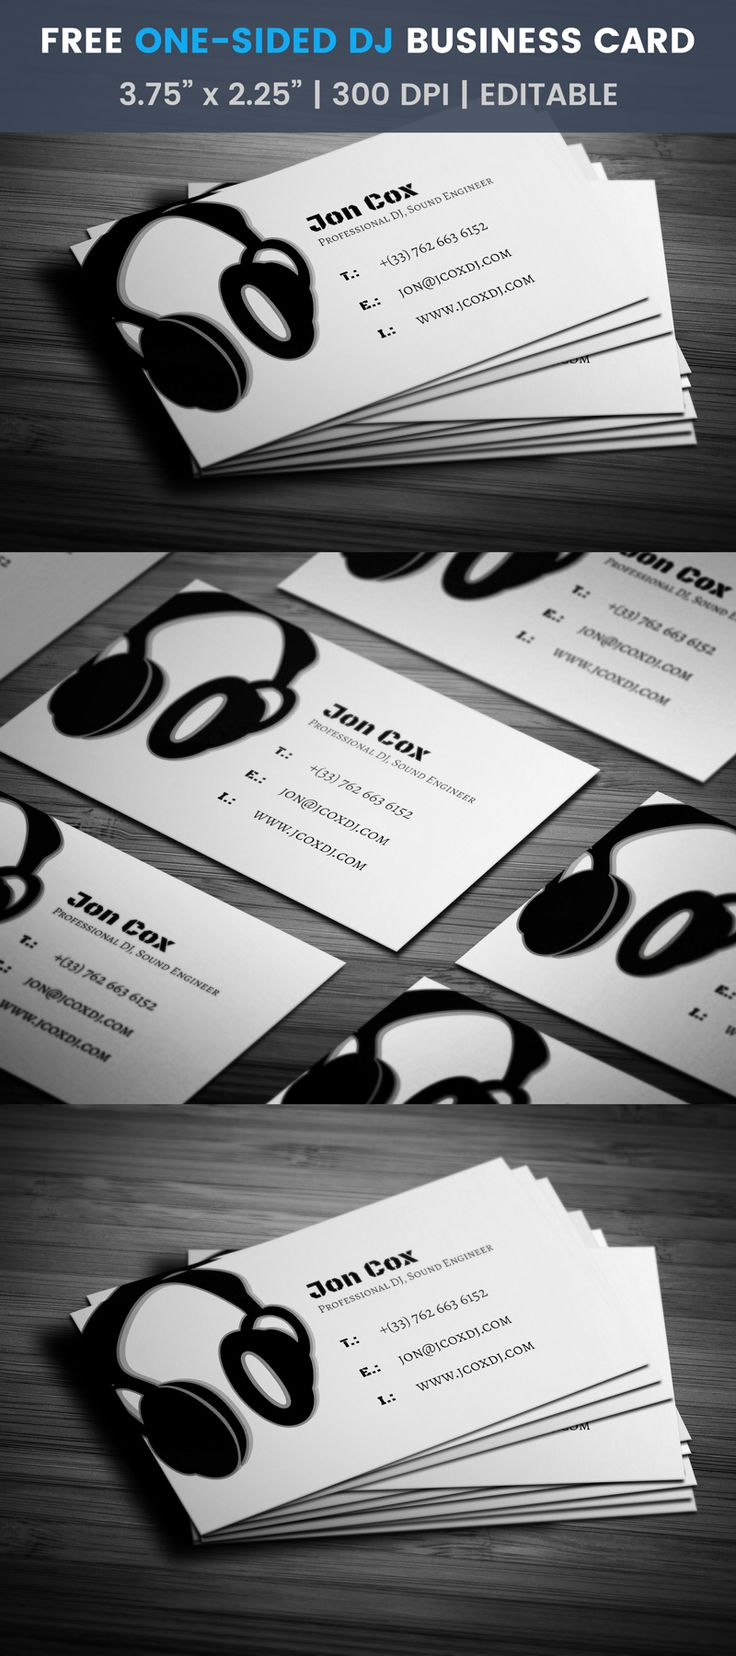 13 best Free DJ Business Cards images on Pinterest